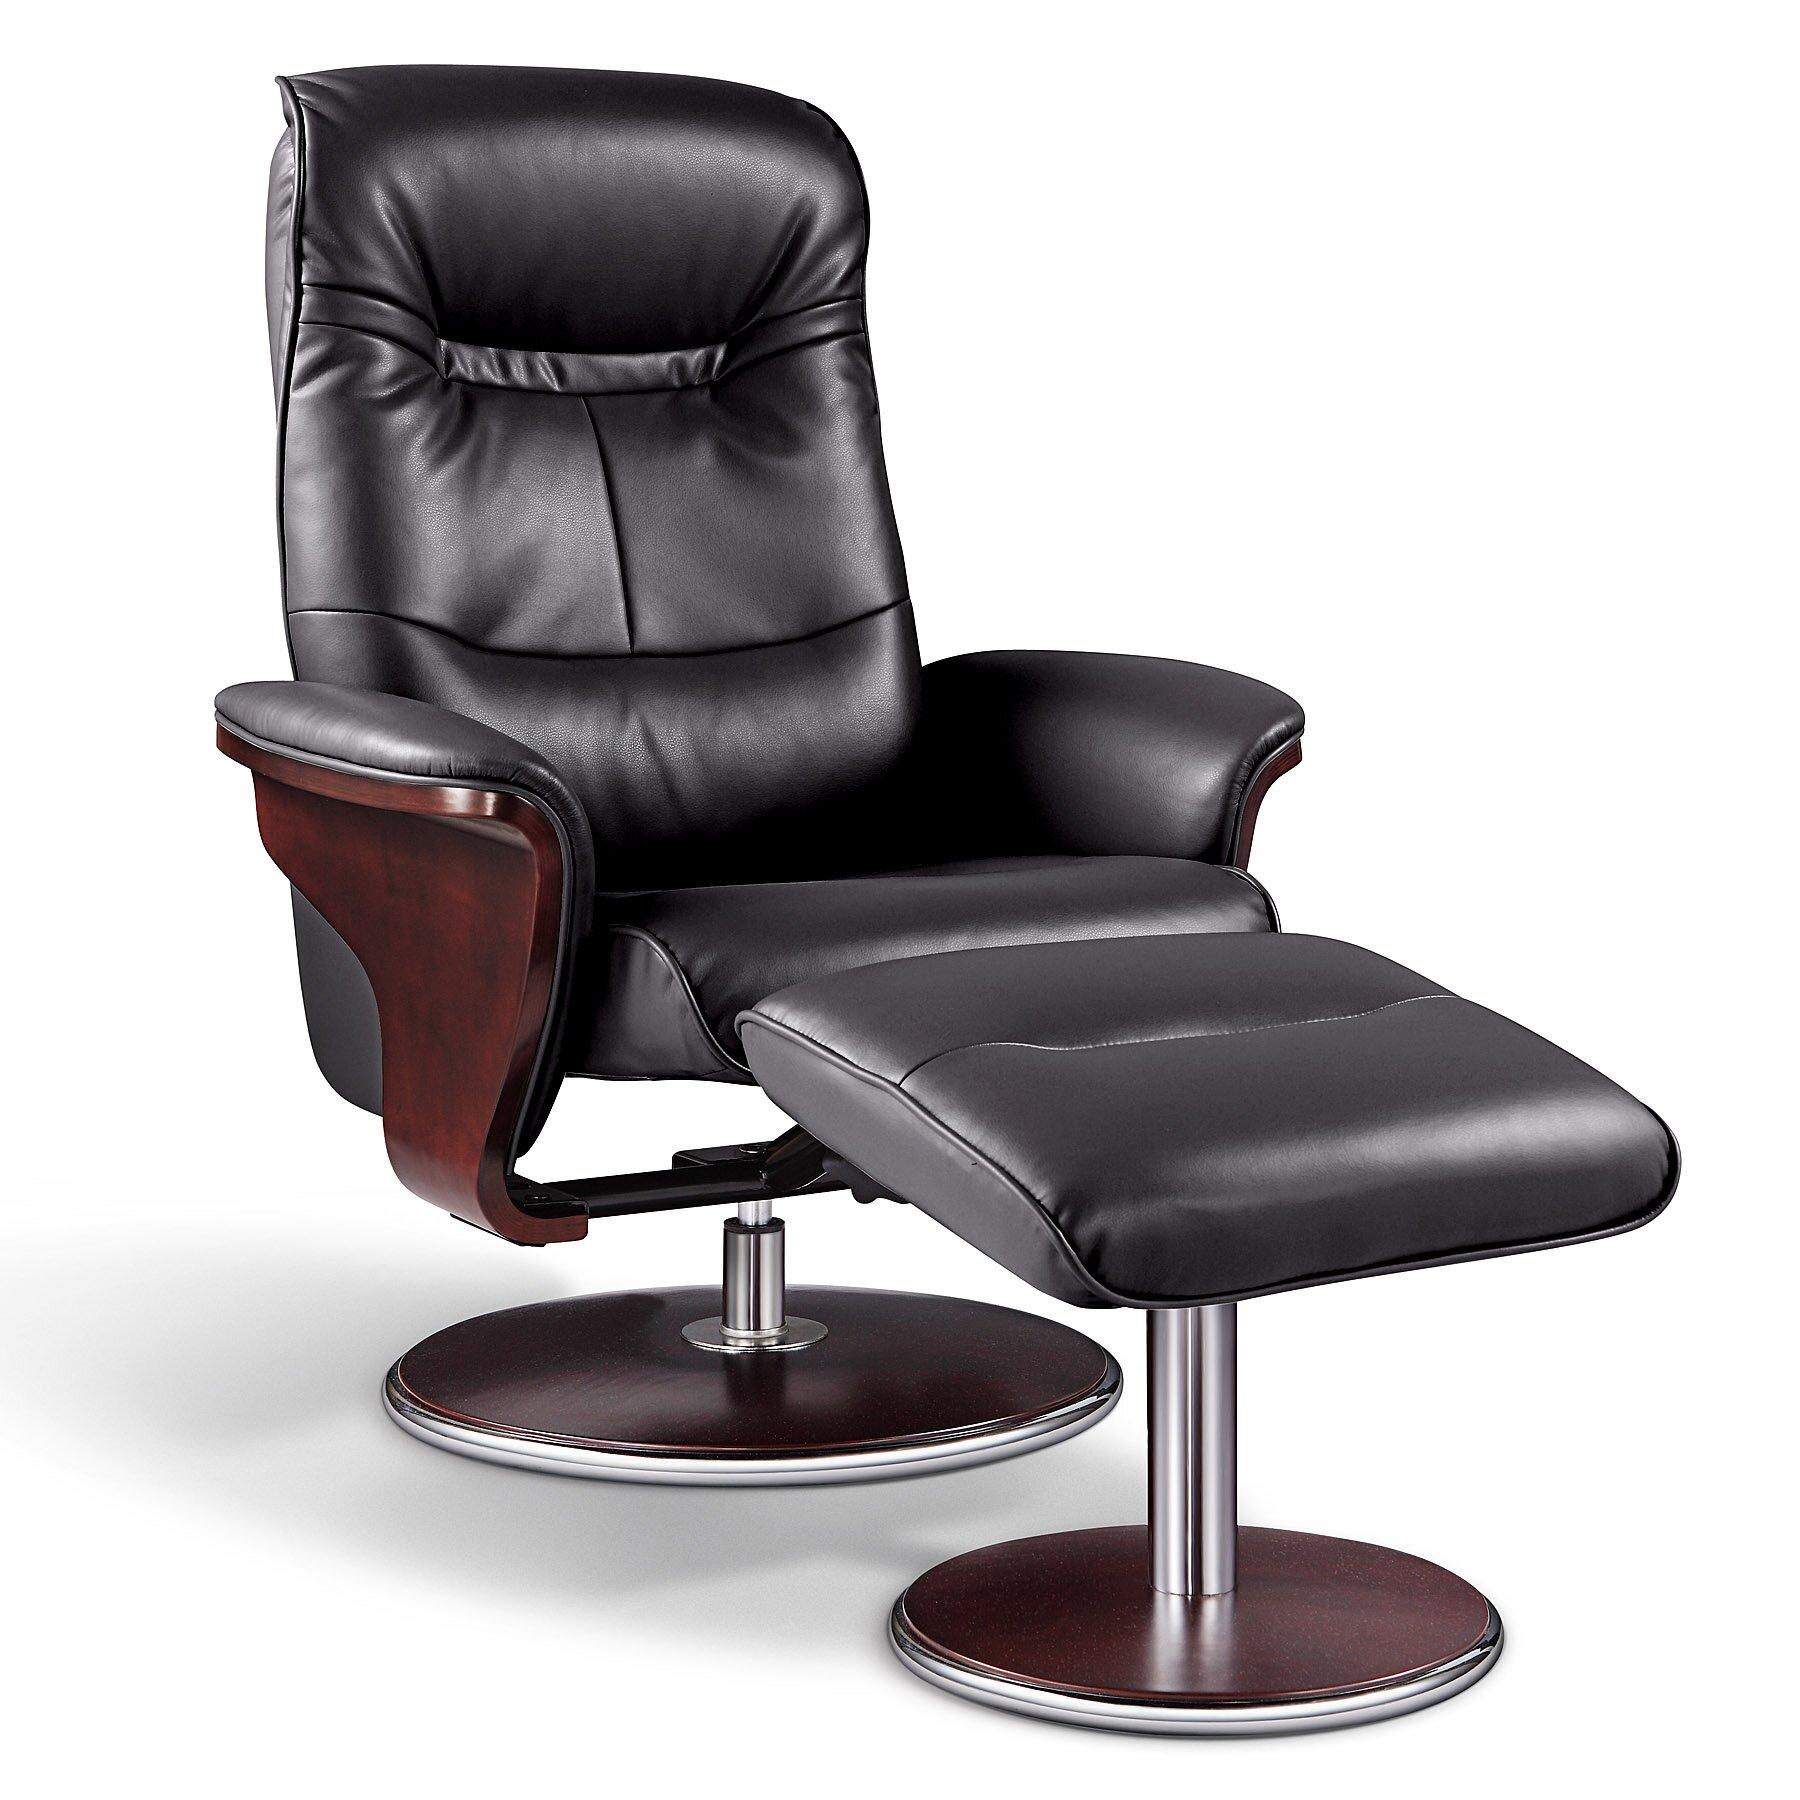 furniture living room furniture black recliners artiva usa sku